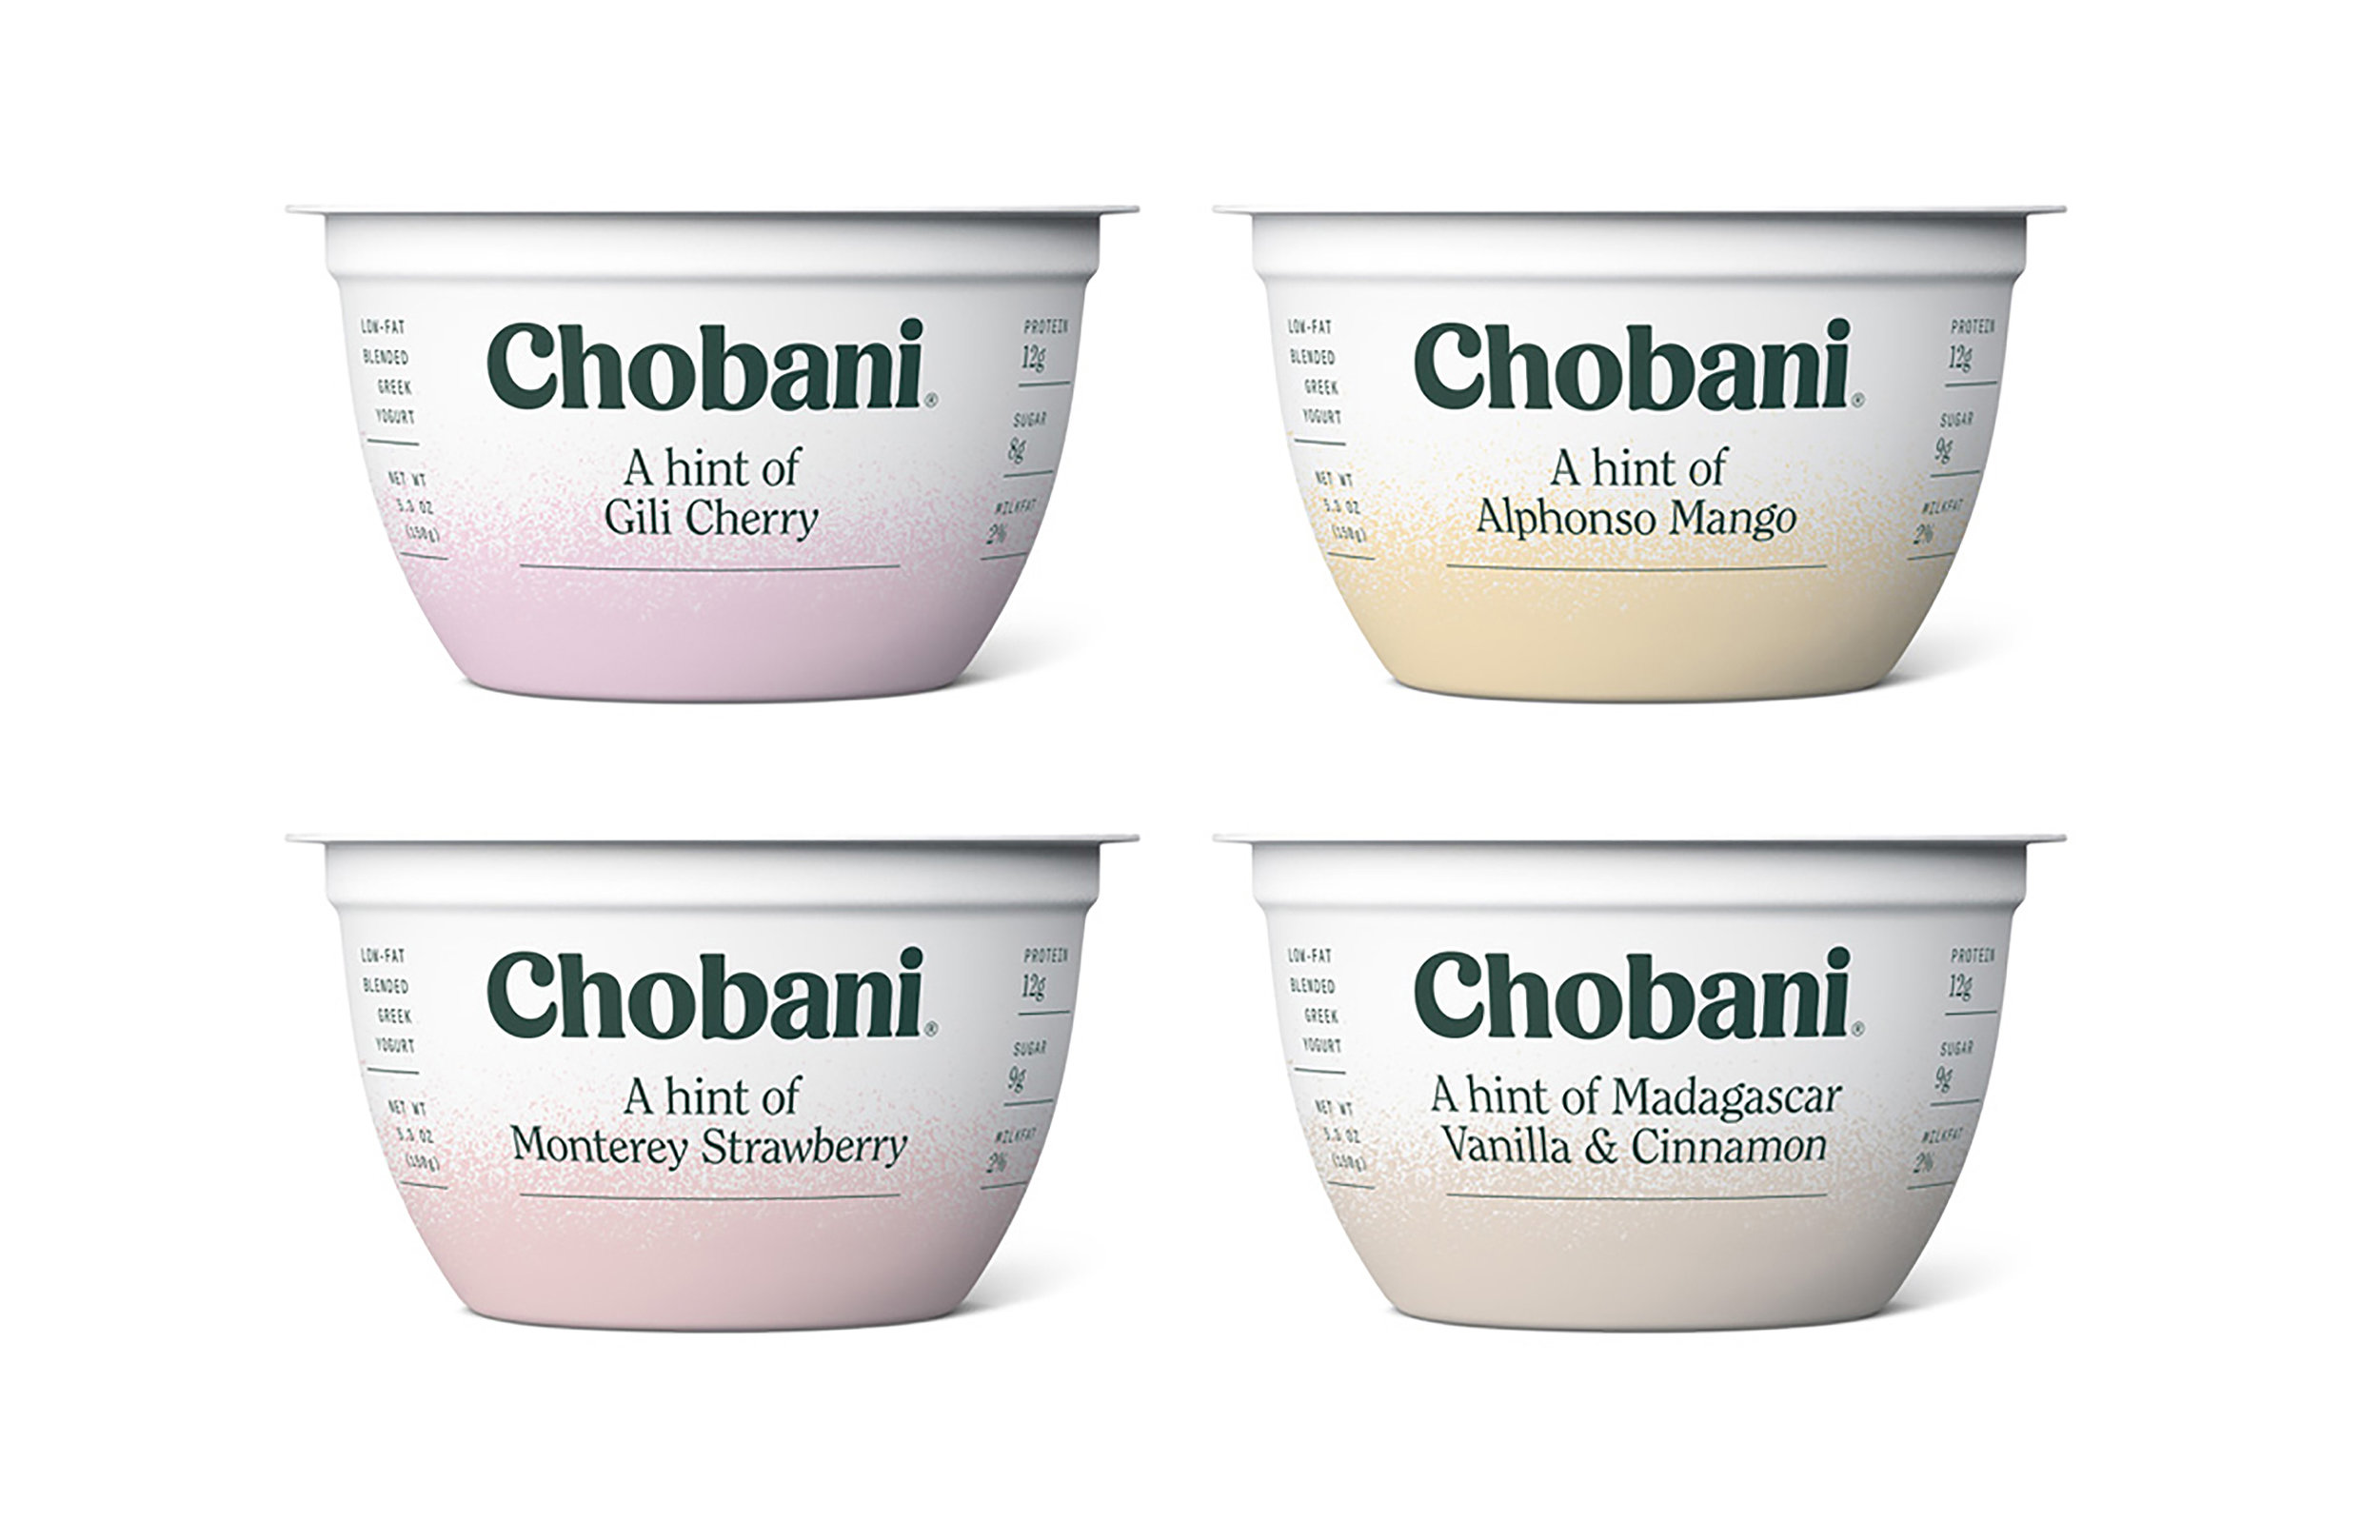 chobani_hint_of_2.jpg